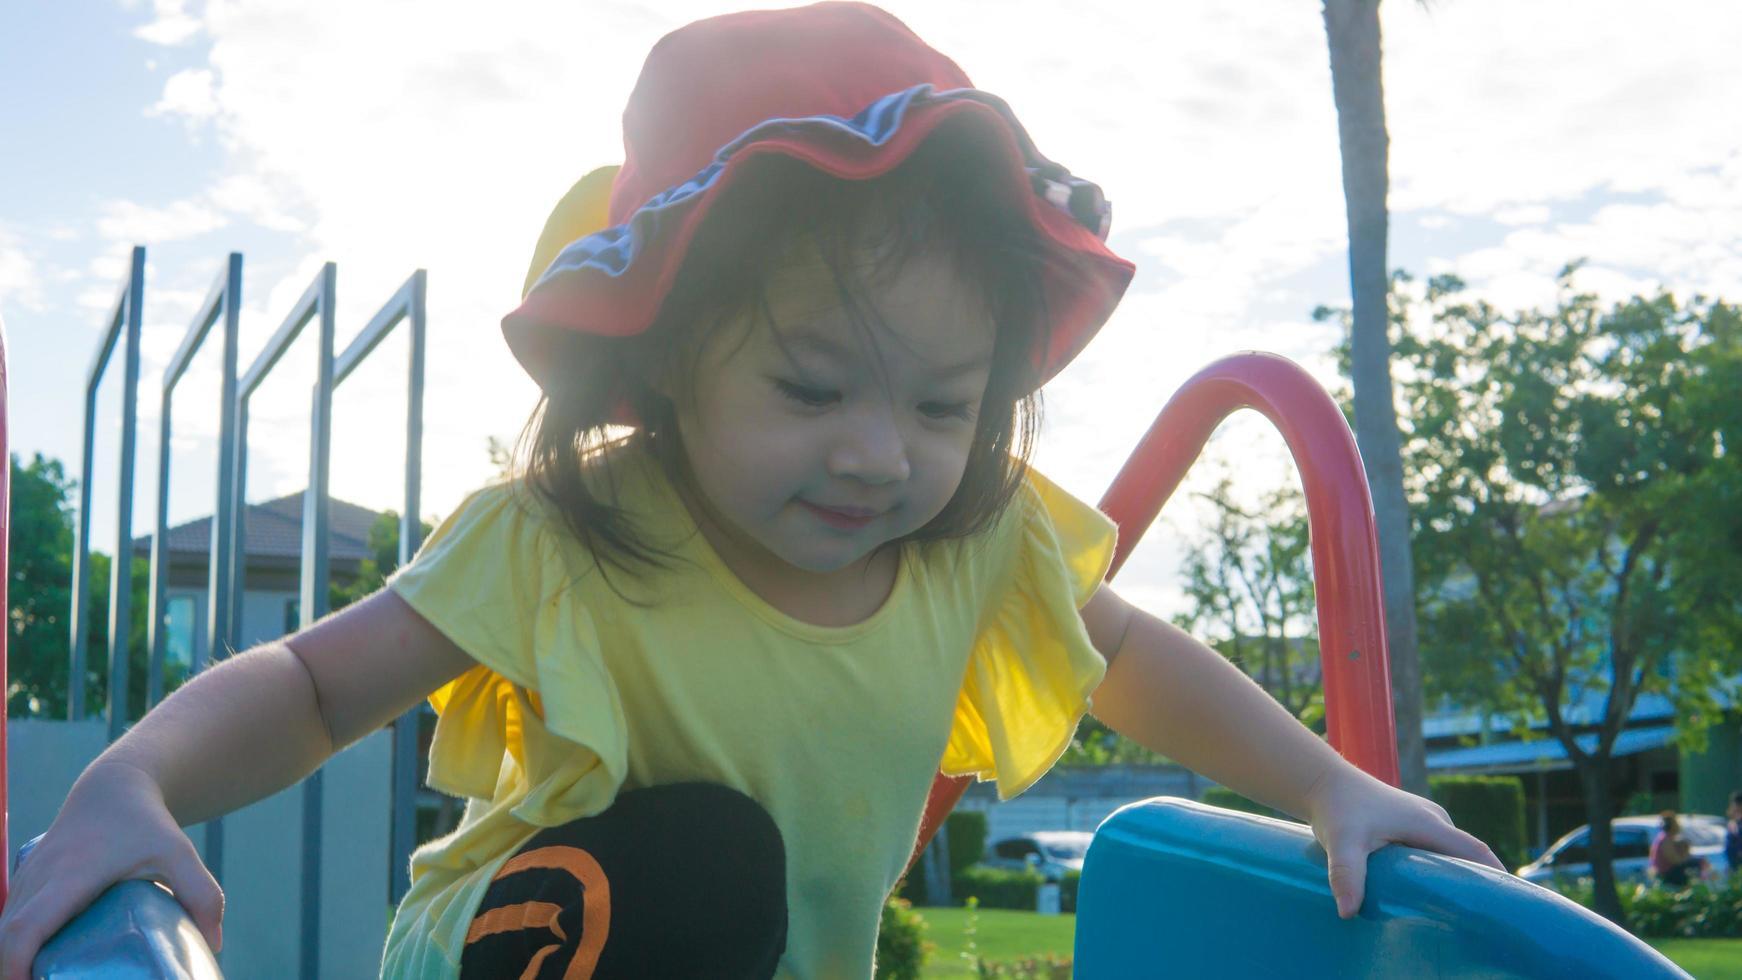 jeune fille jouant dehors photo